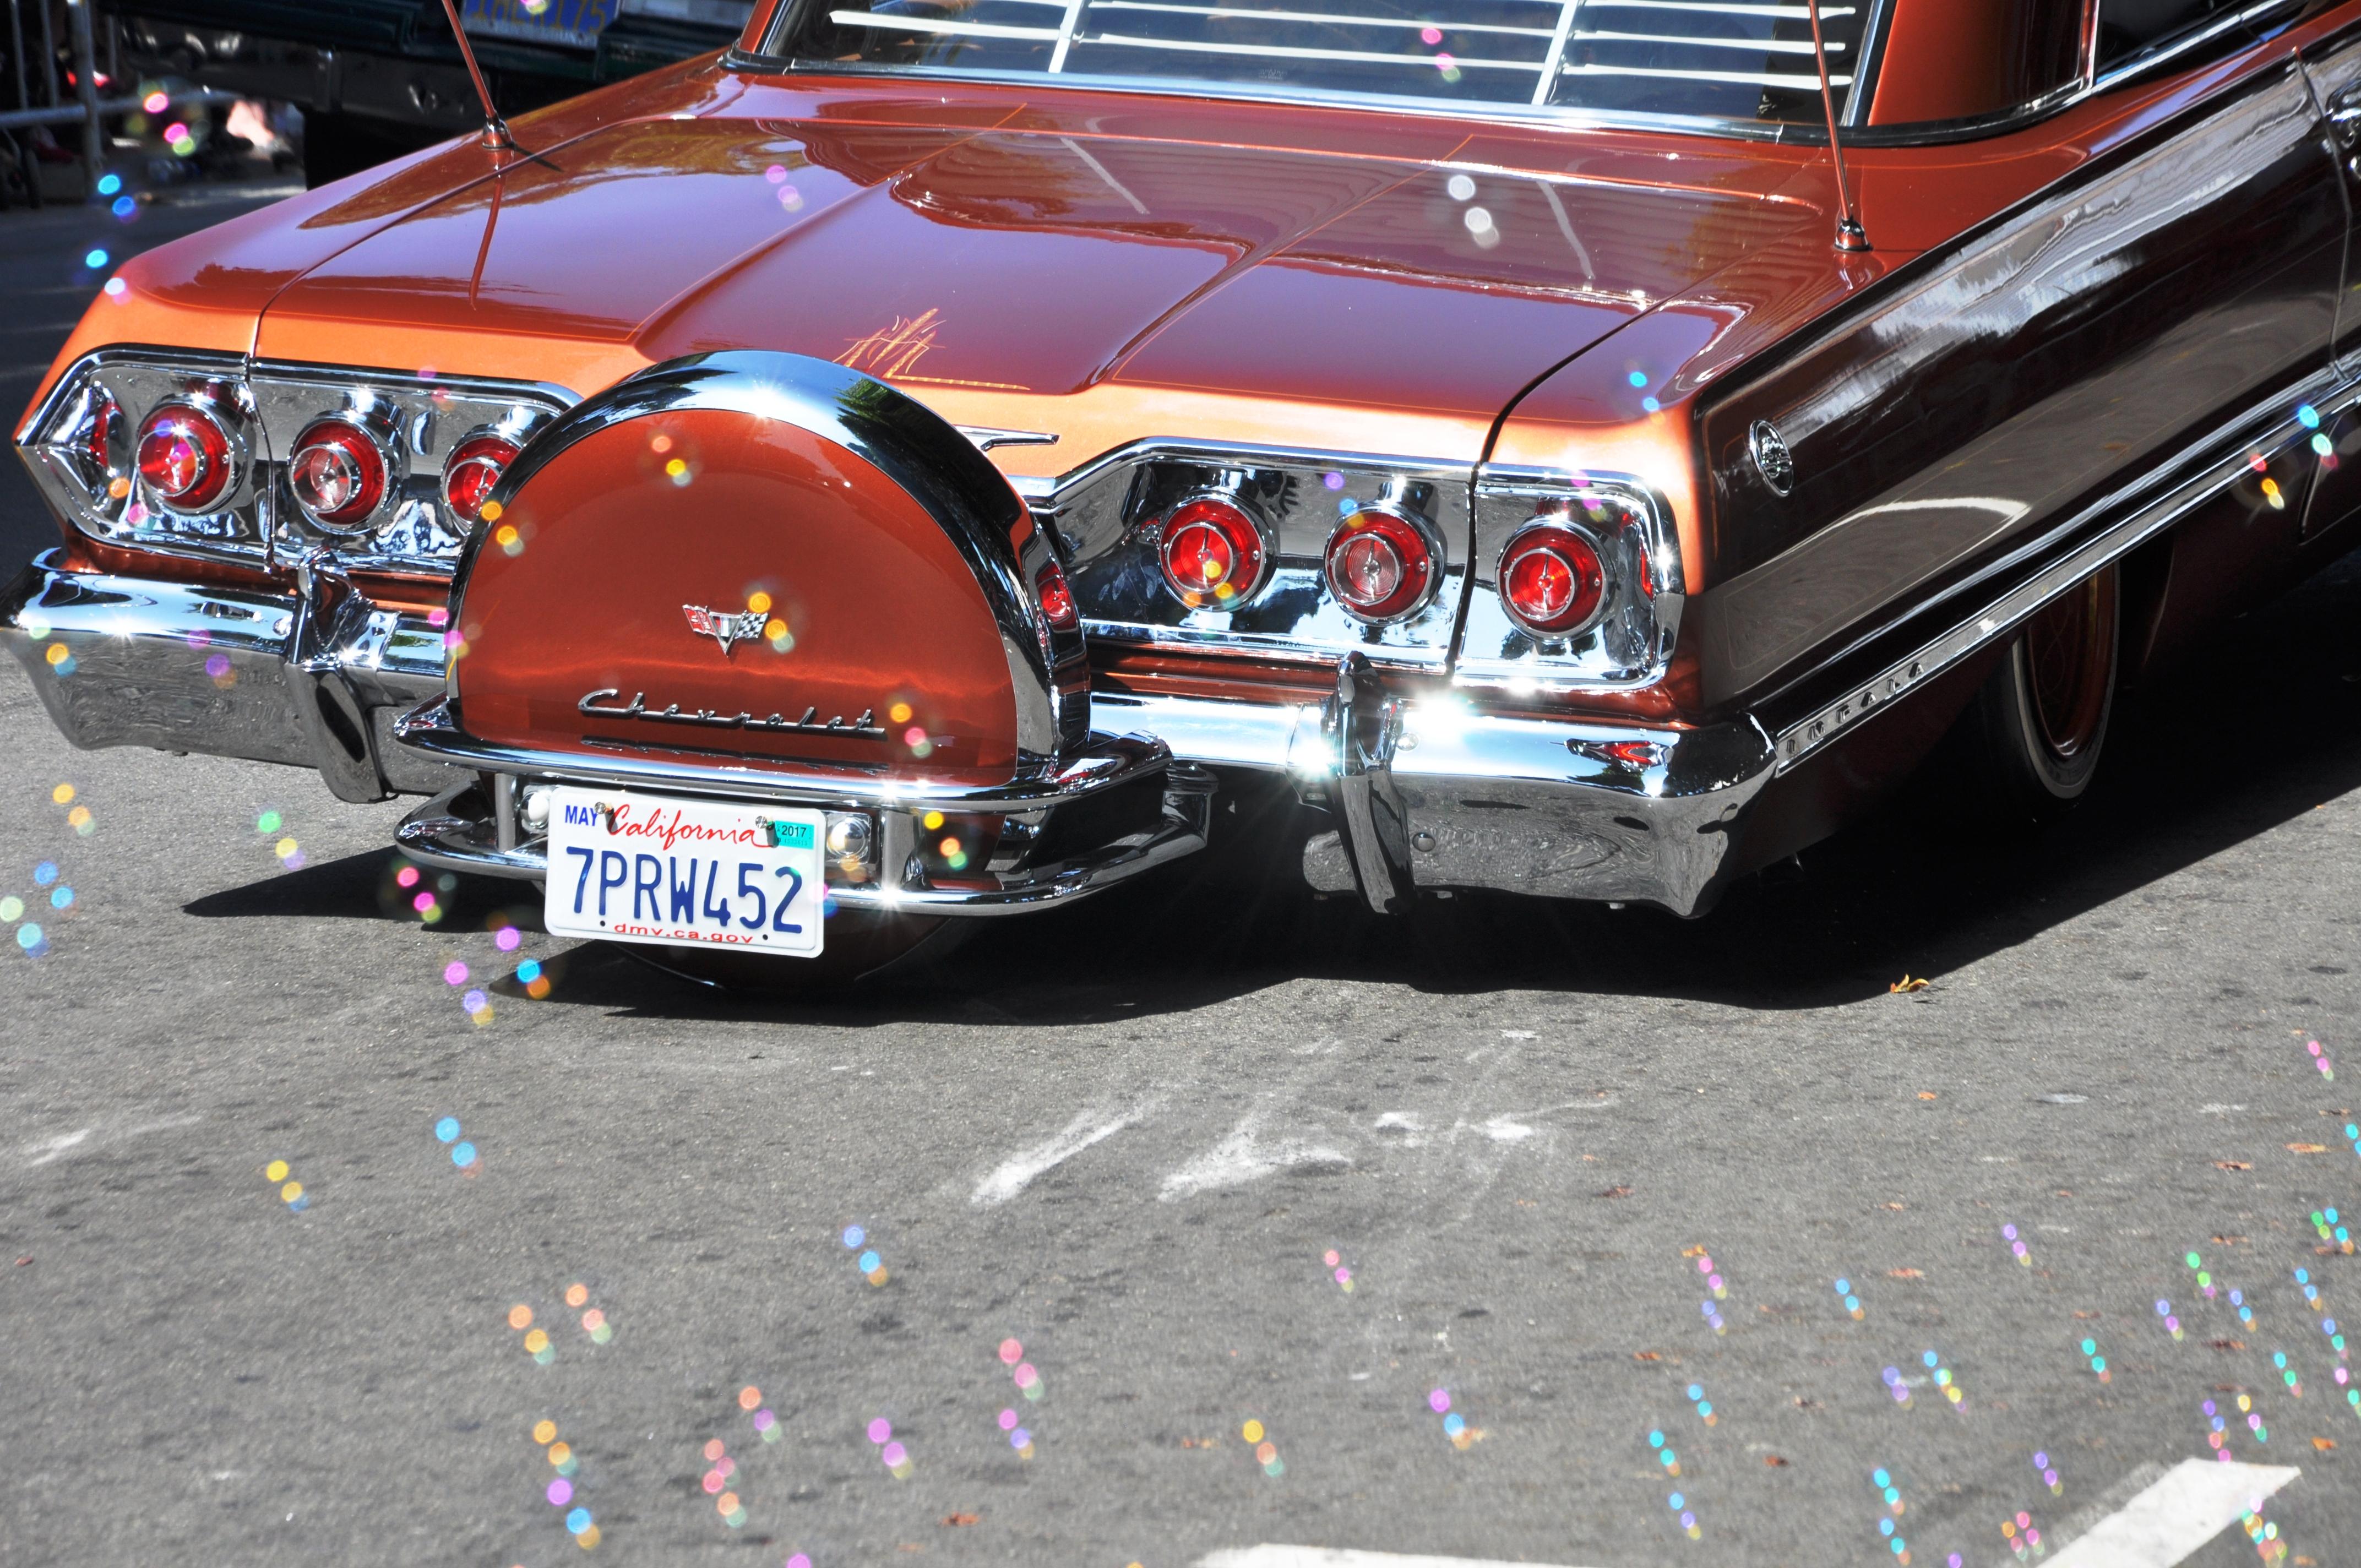 carnaval san francisco 2016 - auto